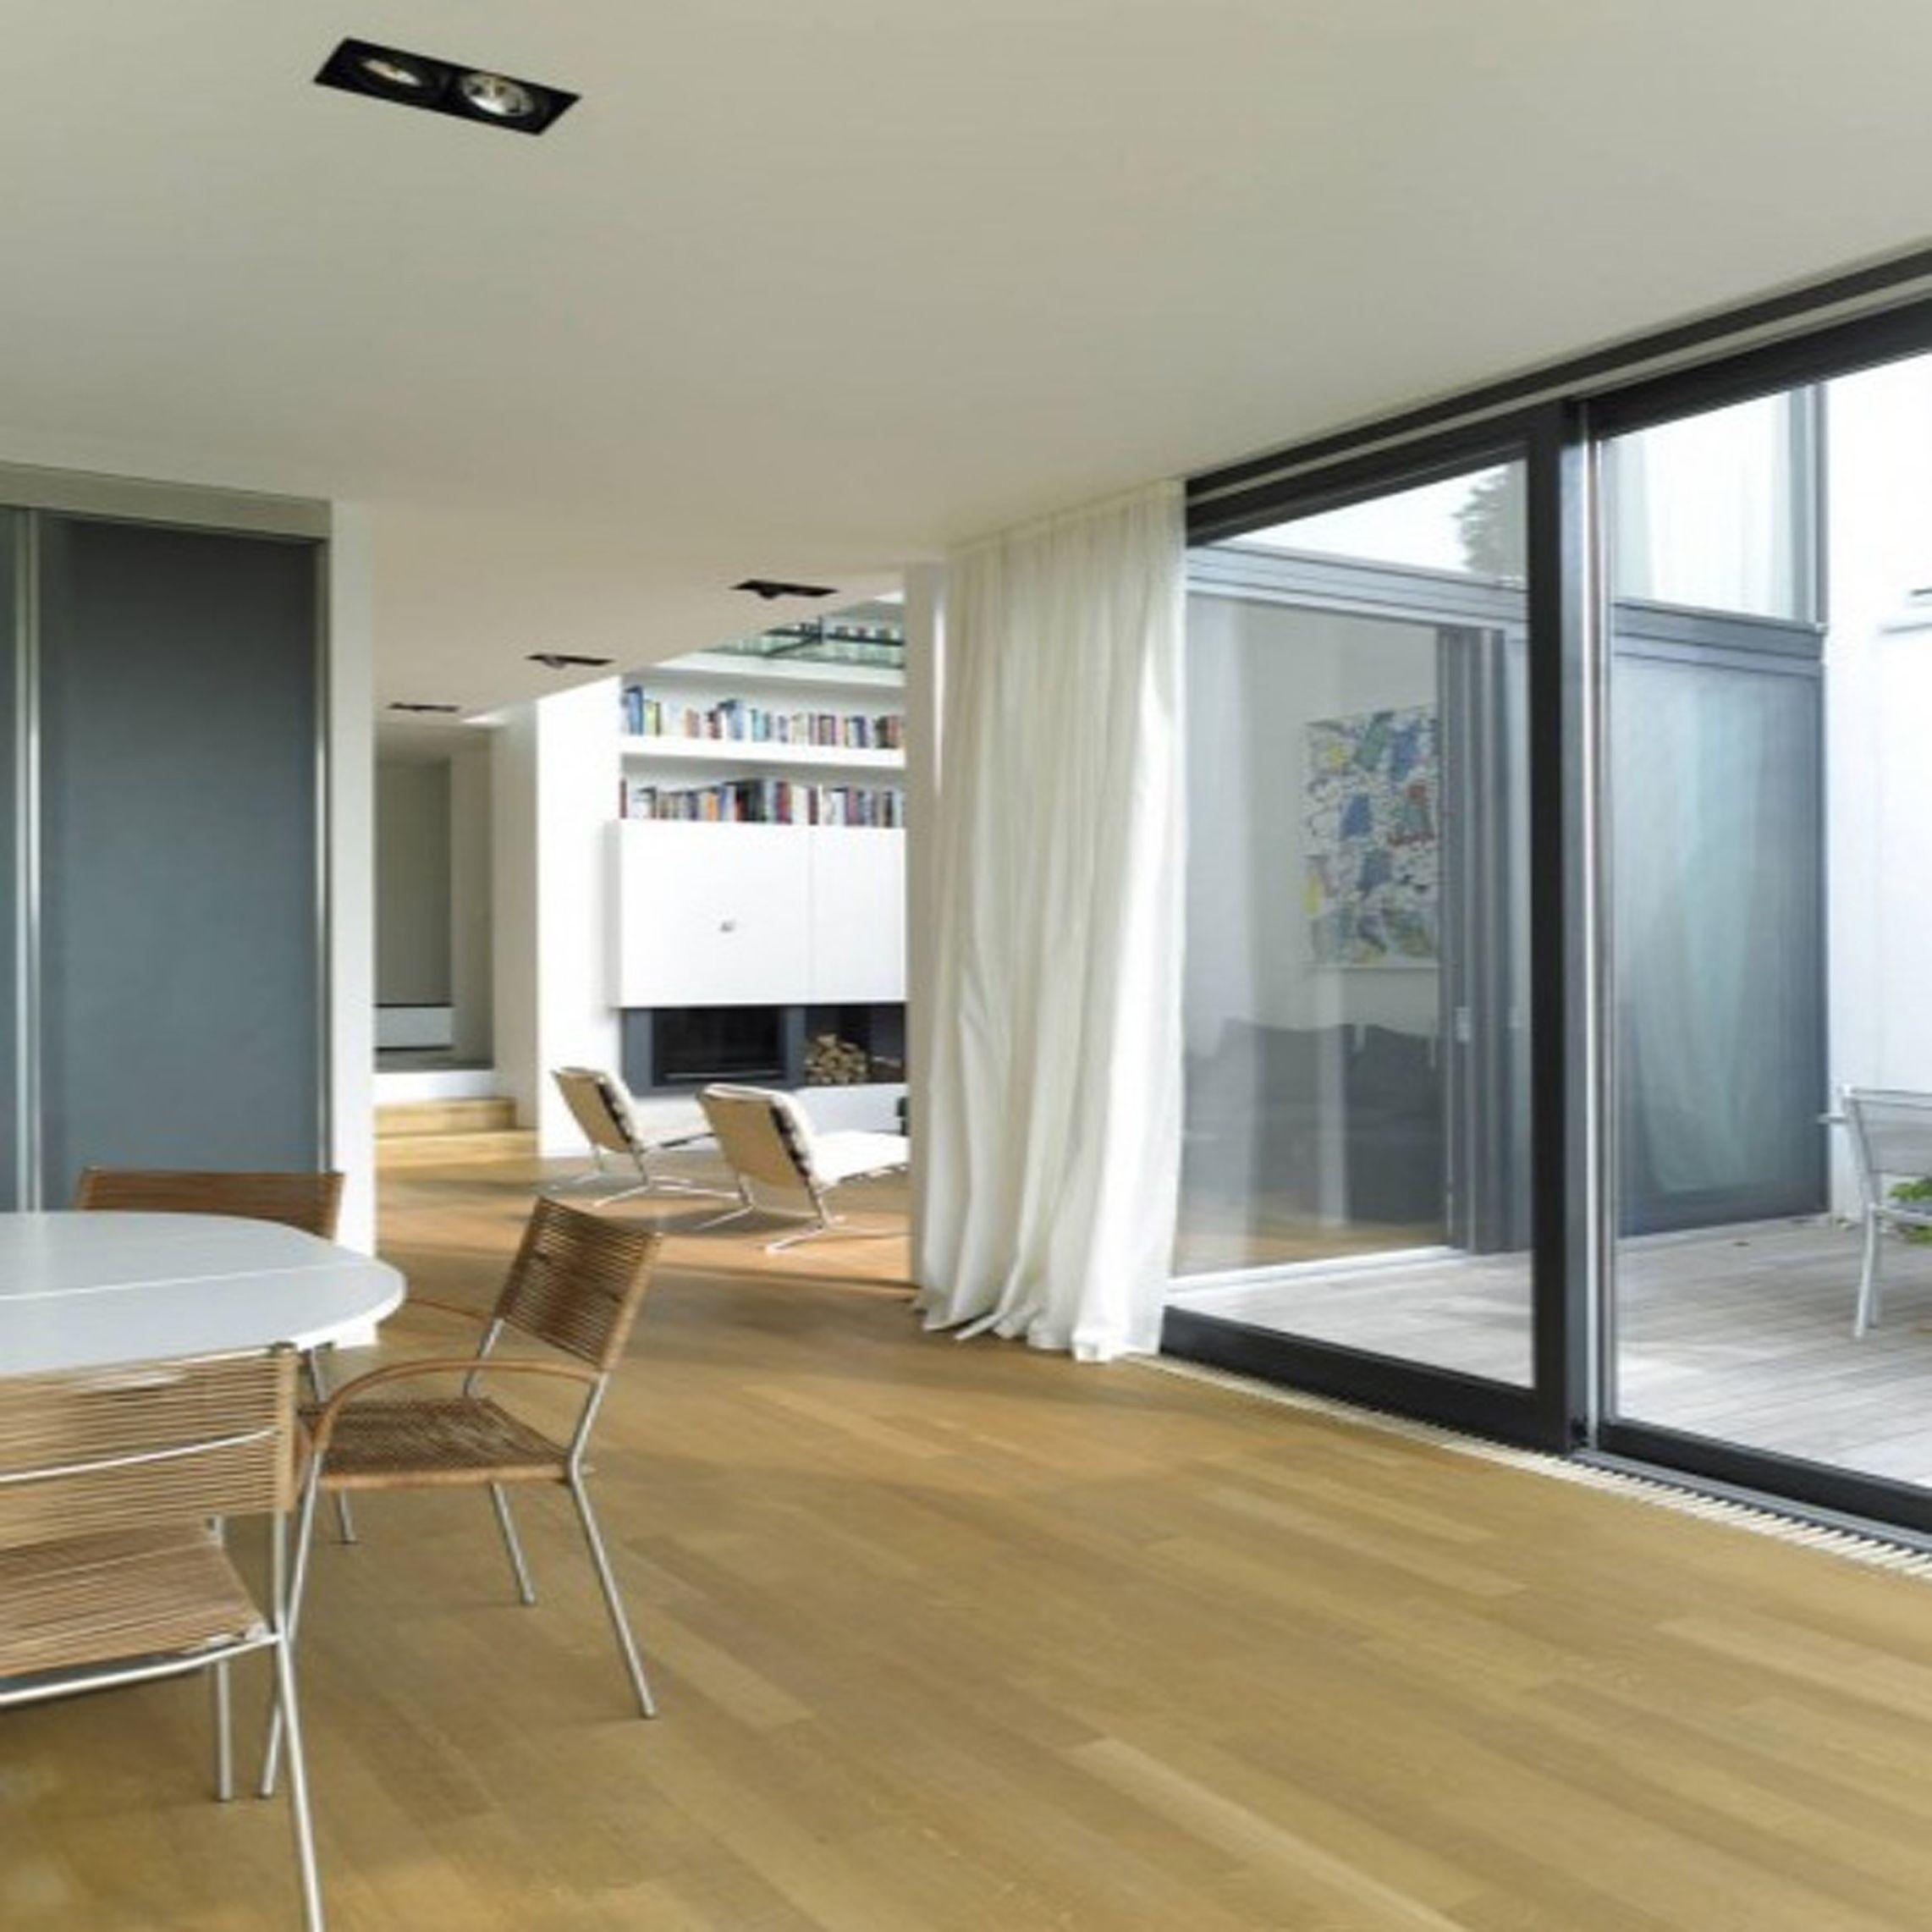 living room furniture sets ikea full living room furniture sets furniture set for living room #LivingRoom